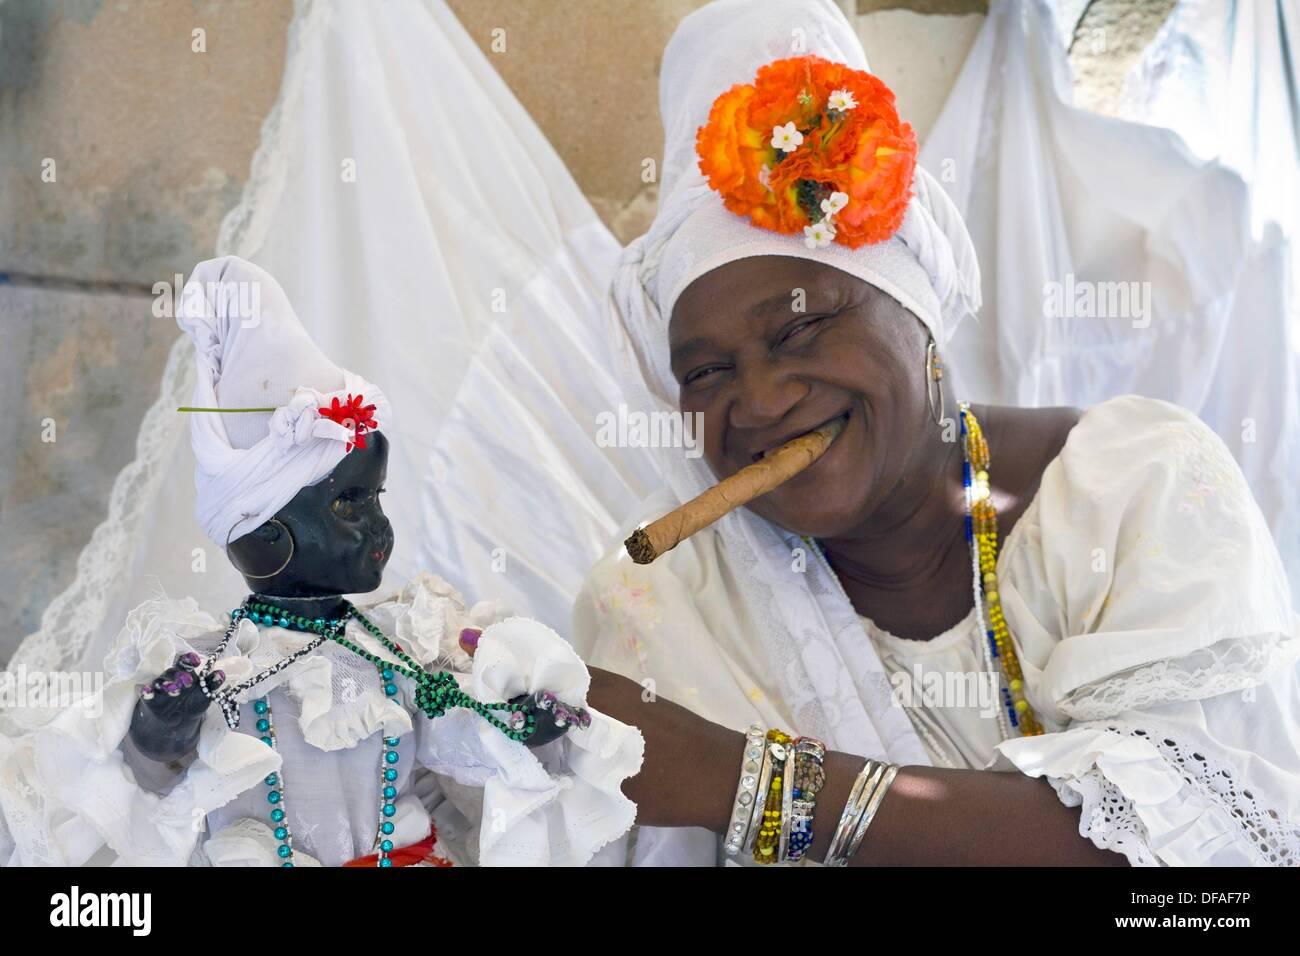 Cuba, Havana, Santeria Priestess - Stock Image